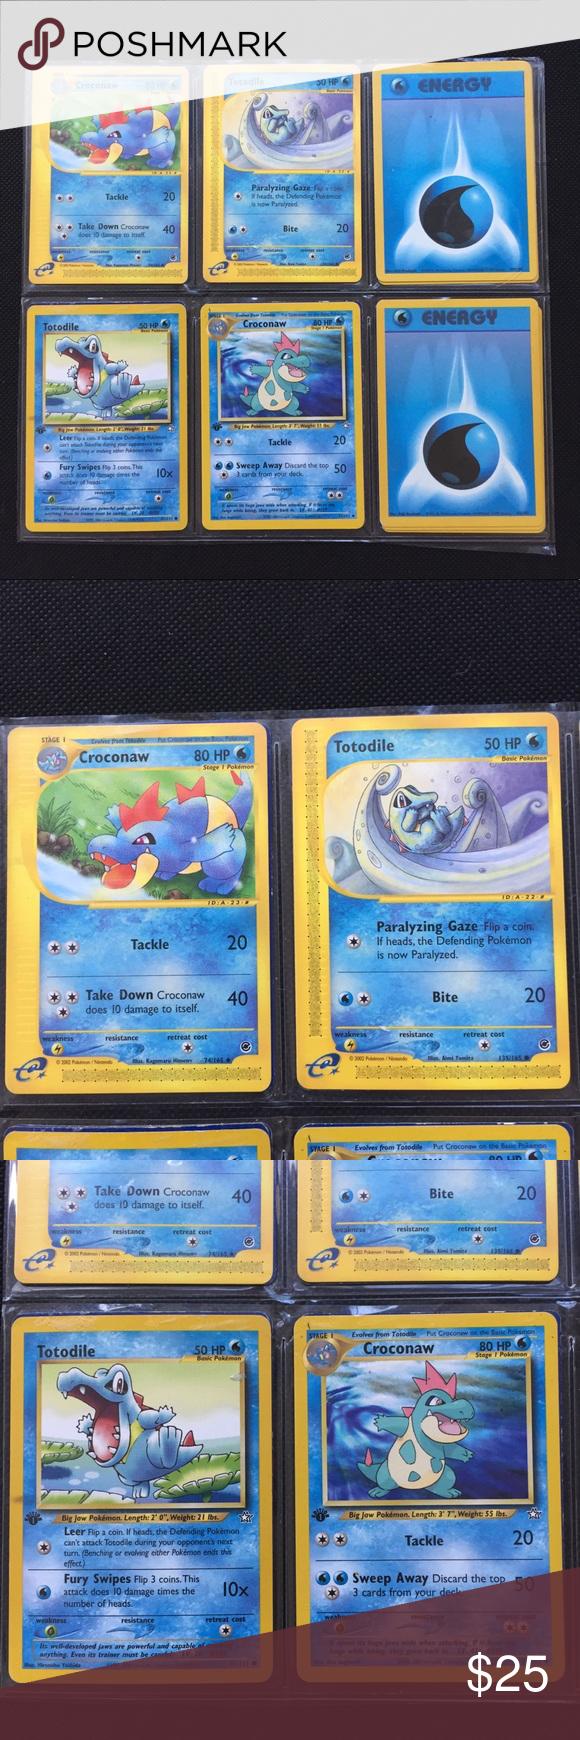 SOLD* Ultimate Totodile Evolution Set 💧 Original pokemon